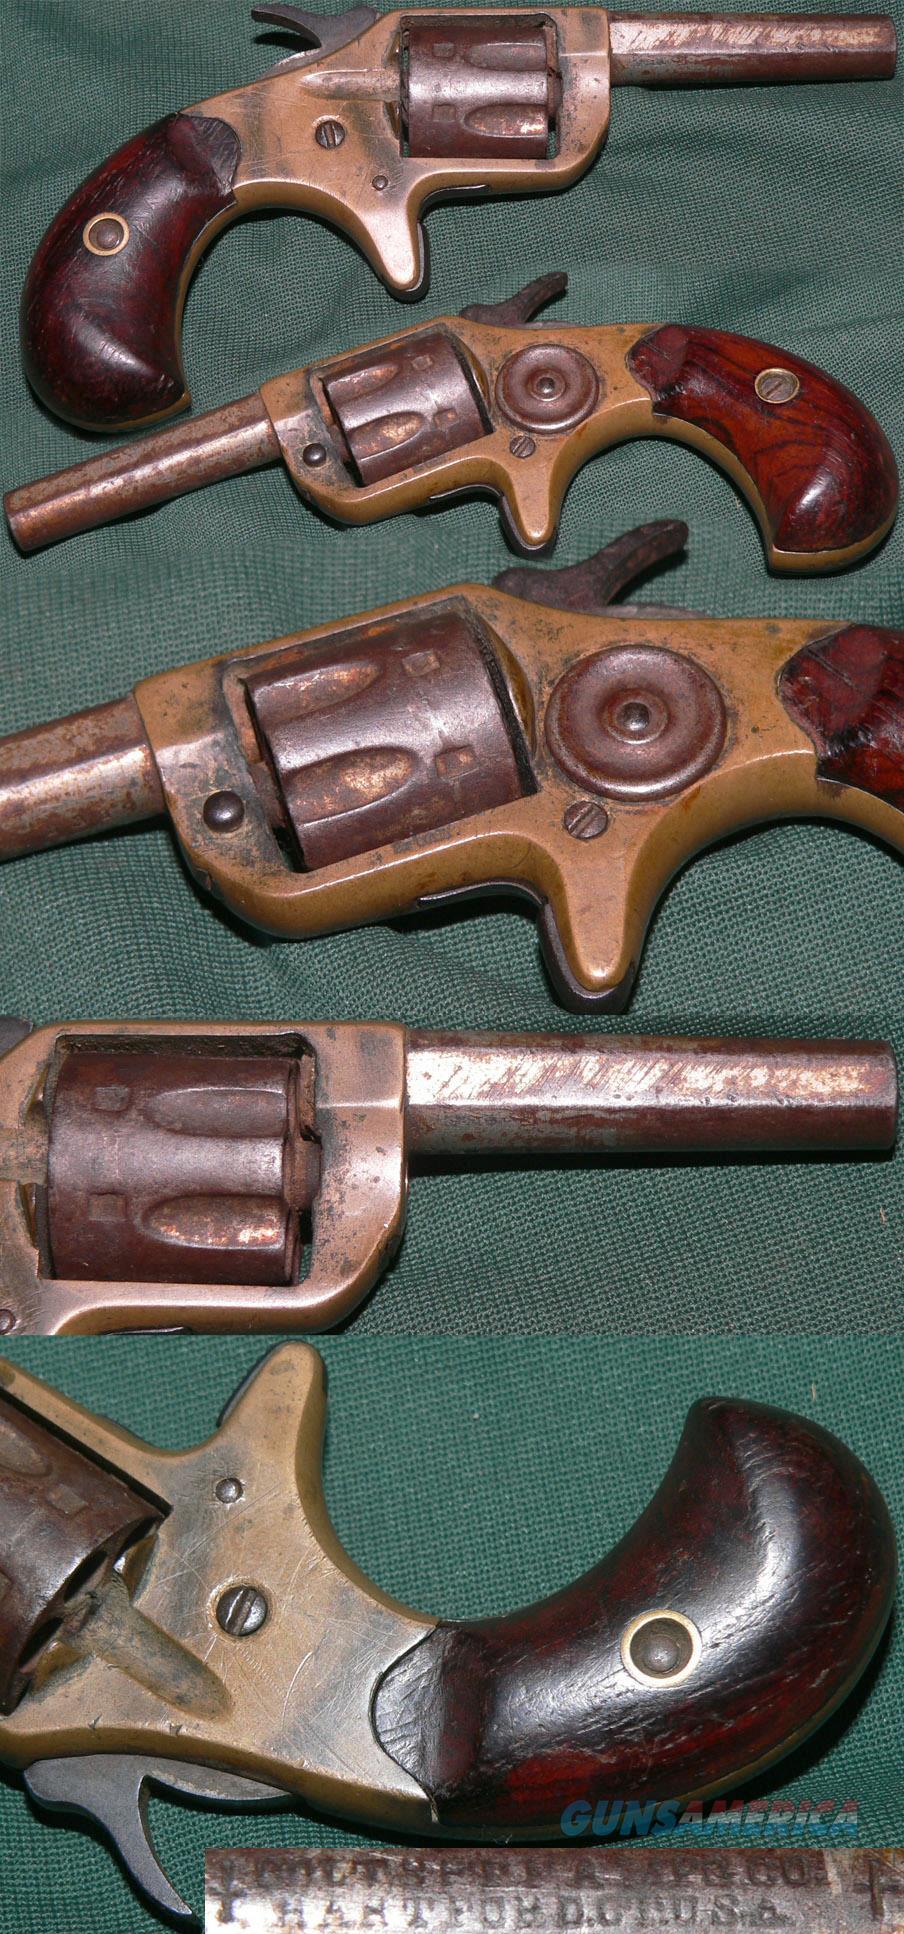 Colt New Line 22 caliber revolver  Guns > Pistols > Colt Single Action Revolvers - 1st Gen.